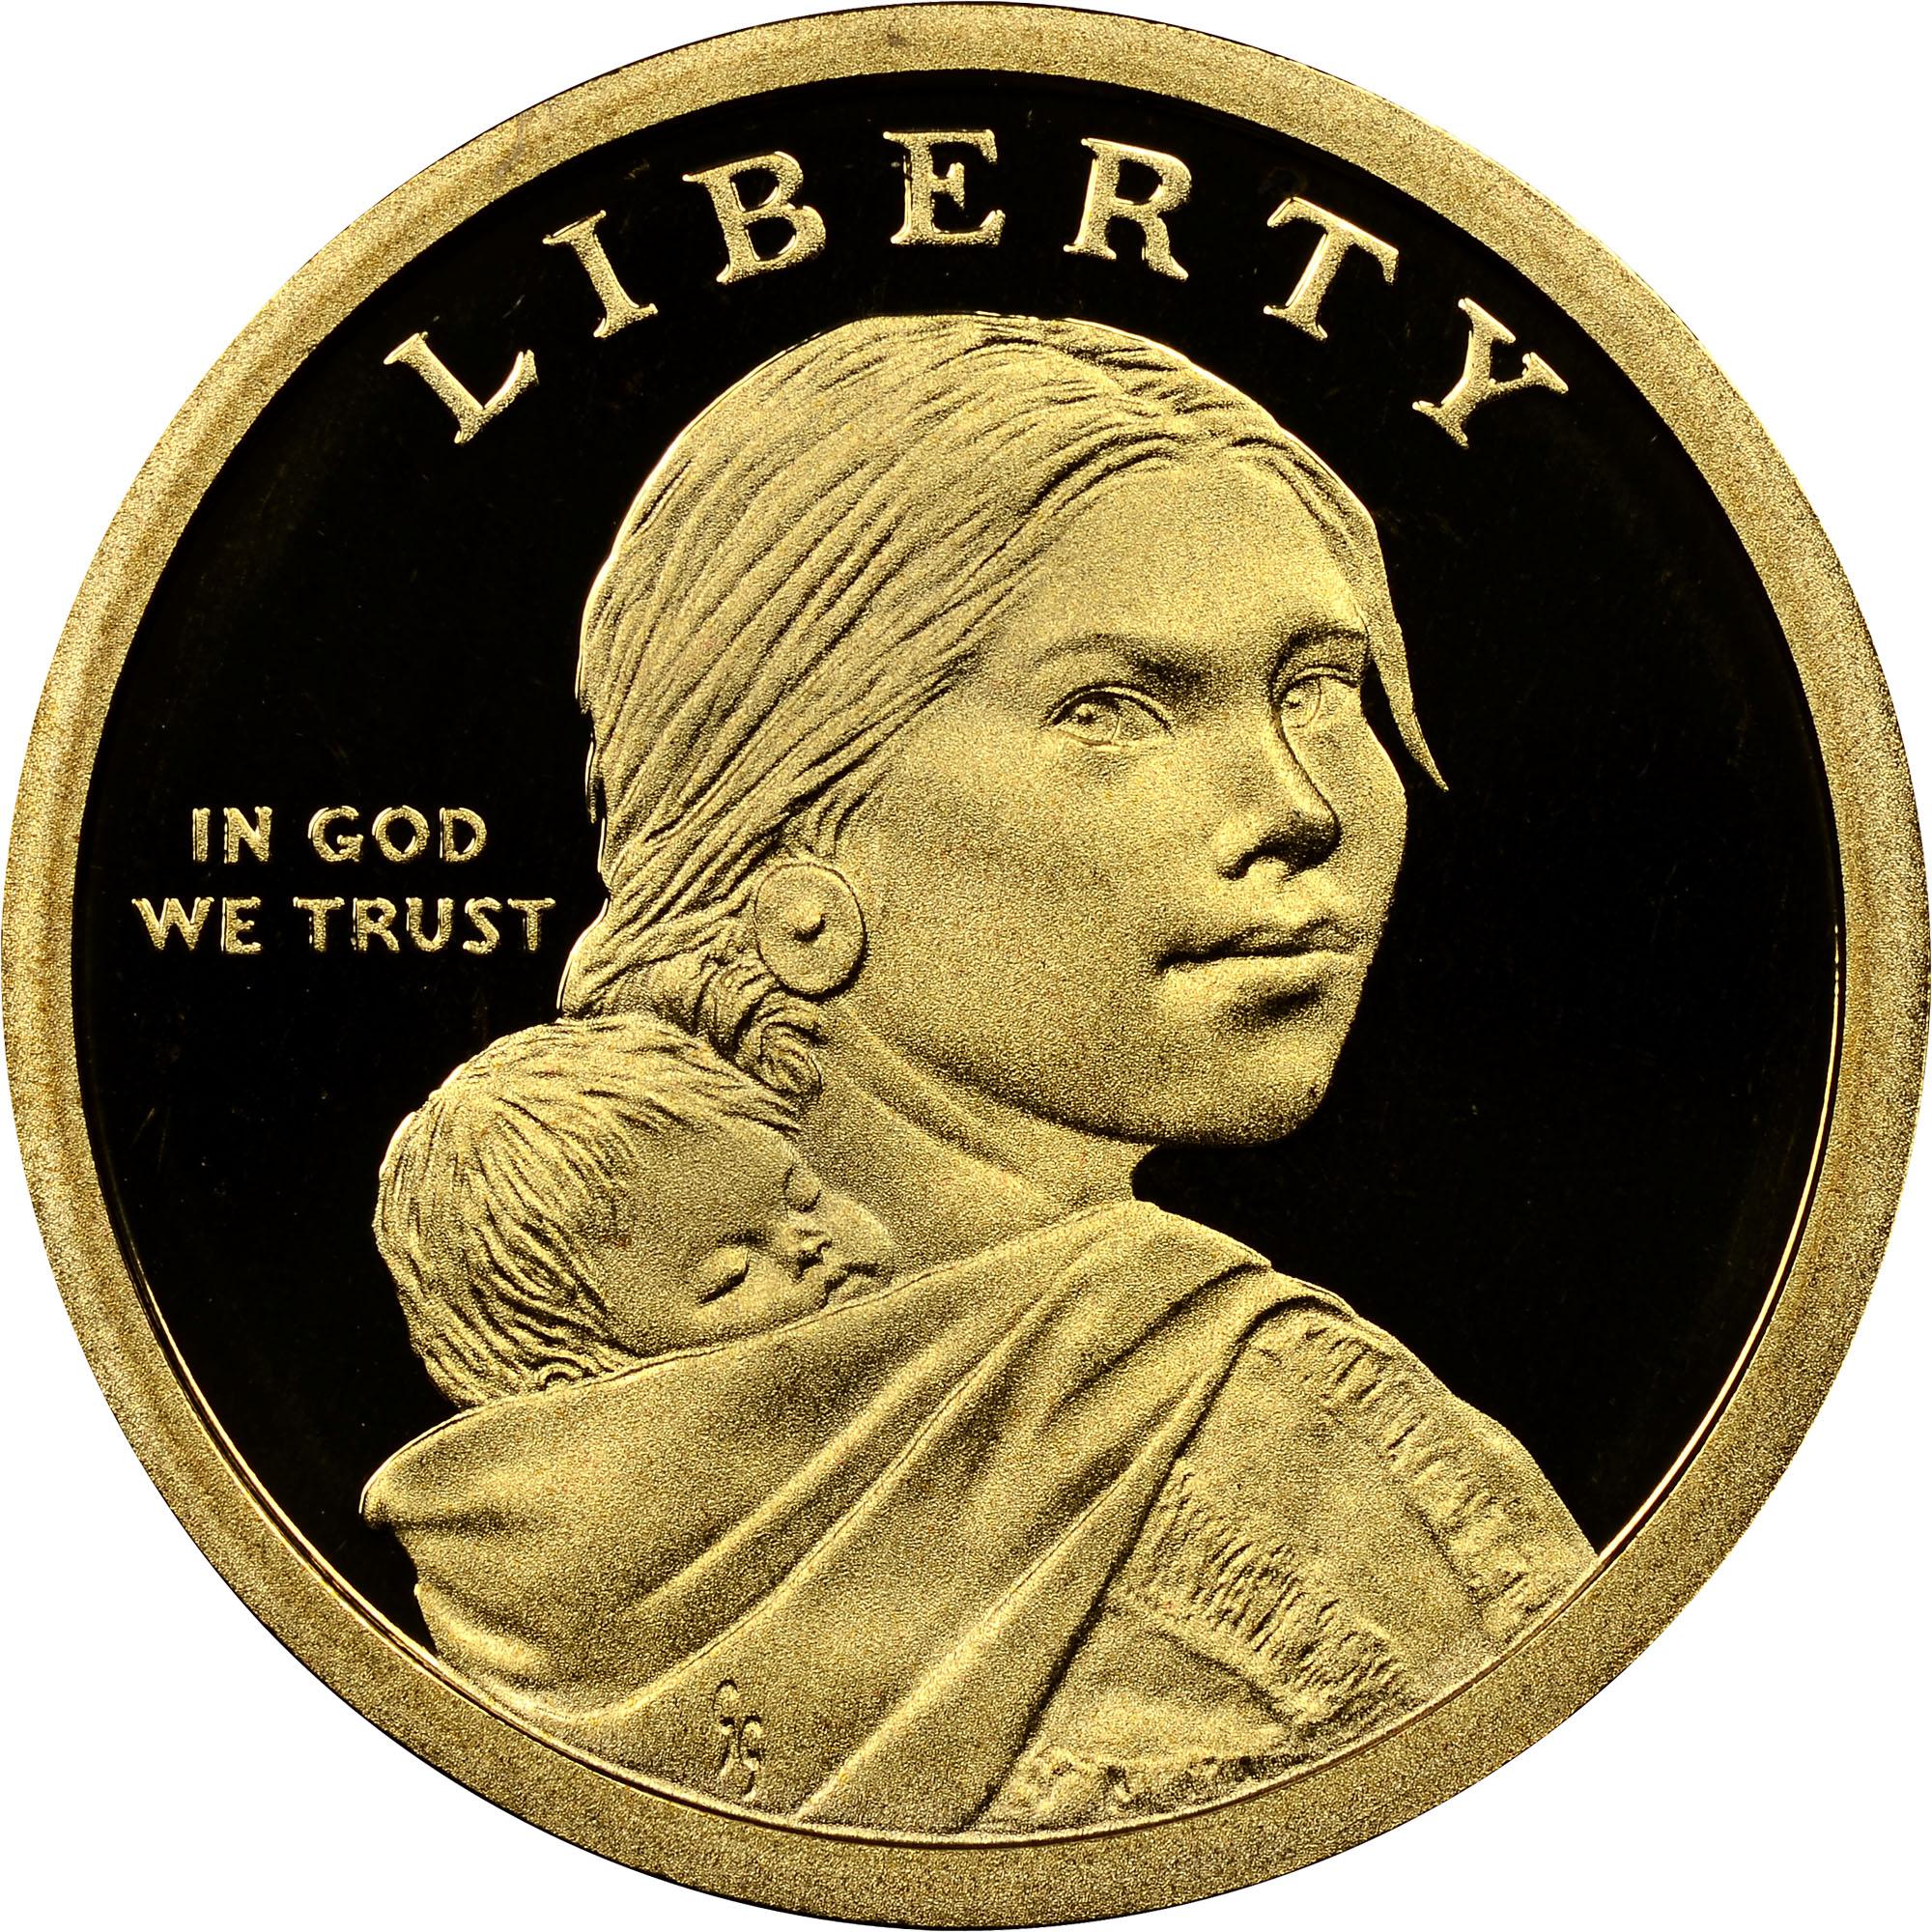 2000 2011 S Sacagawea Native American Proof Dollars Proof Dollars 1 Run Set Pf